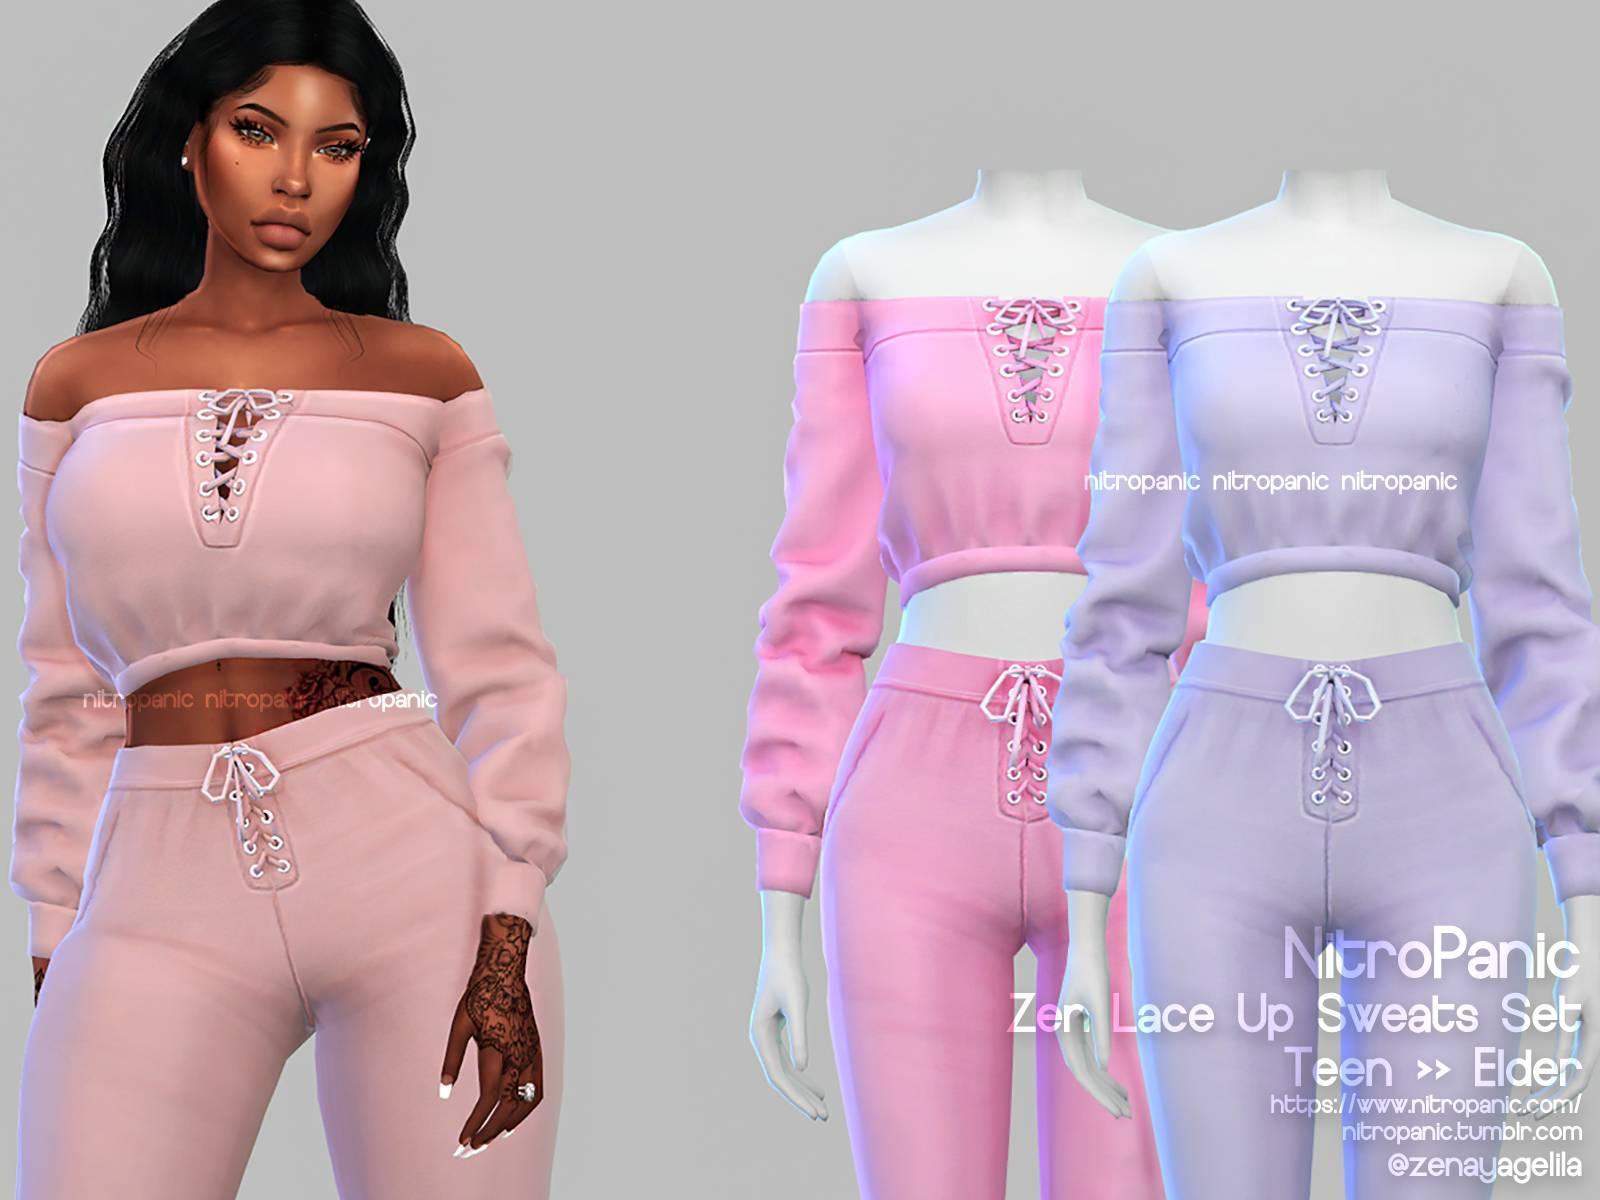 Комплект одежды - Zen's Lace Up Sweats Set